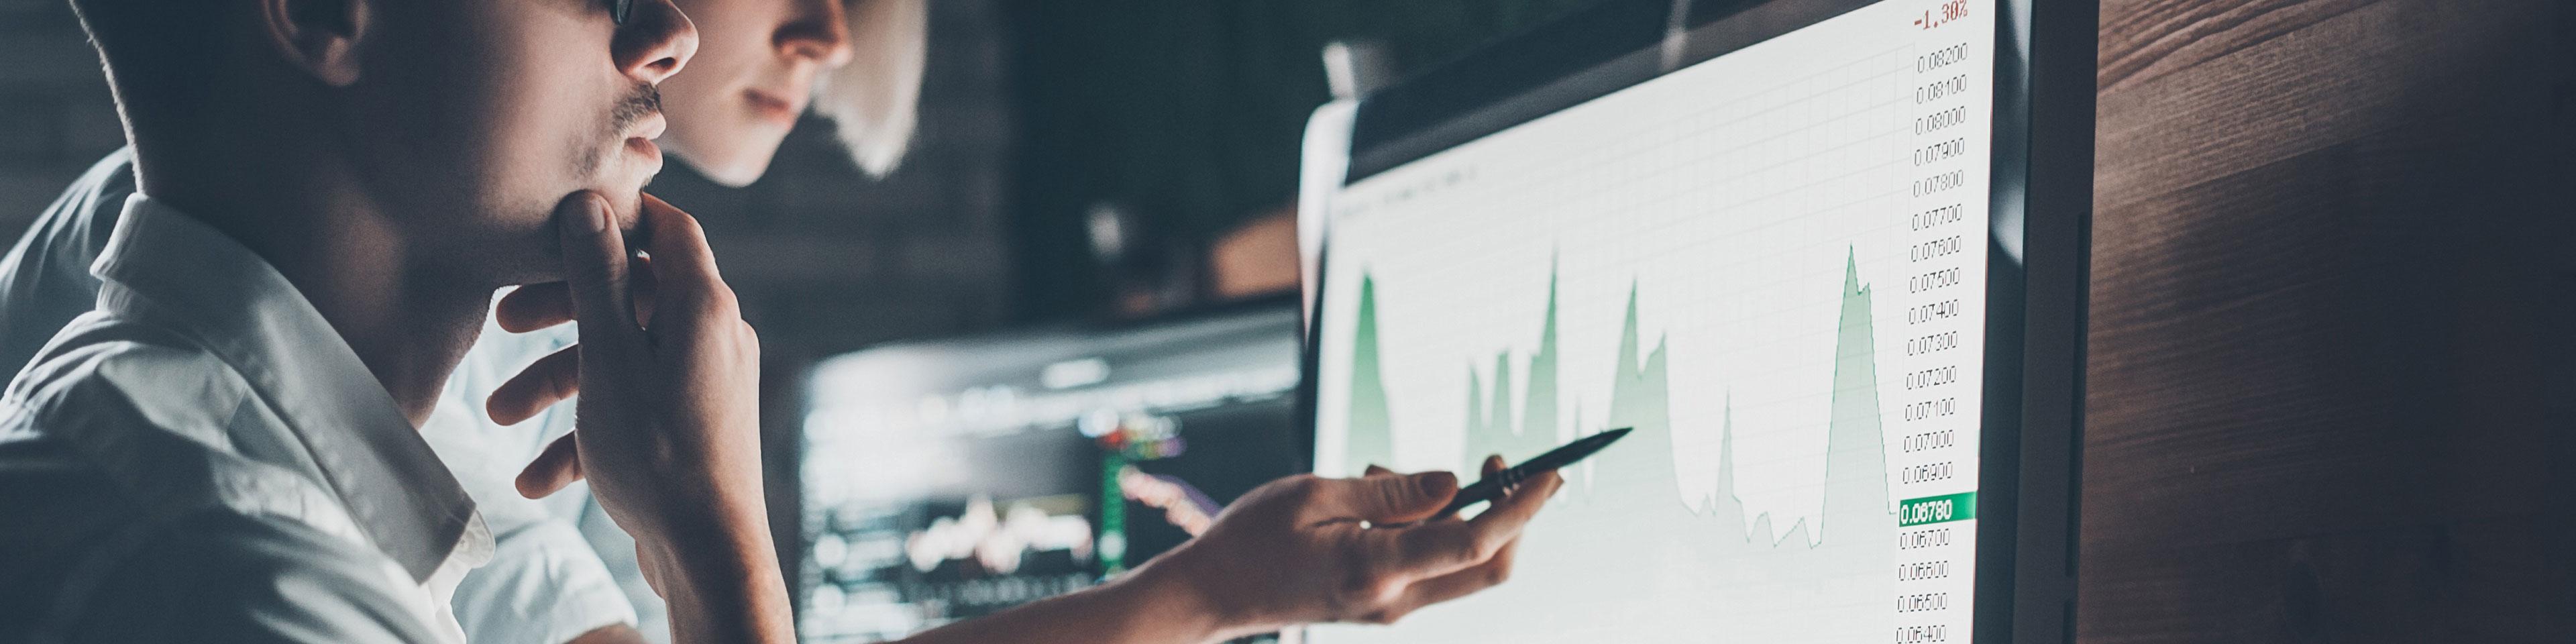 Americas Q2 Finance, Risk and Regulatory update webinar 2021